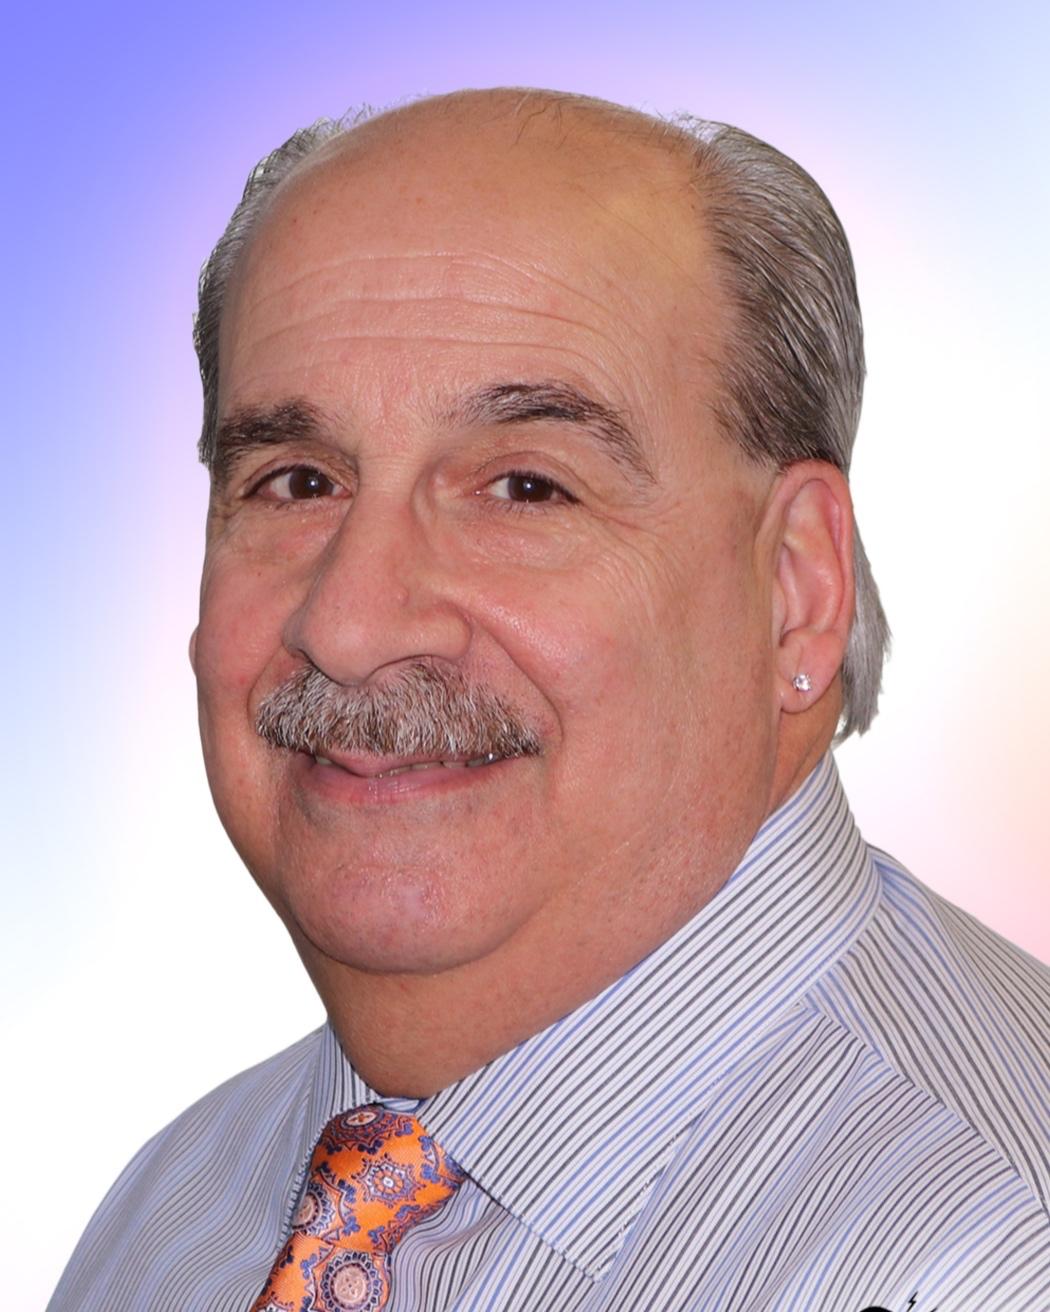 Ron Gurrieri - CSEA Local 830 Executive Vice President • CSEA Local 830 Political Action Committee Co-Chairman • Region 1 Political Action Committee